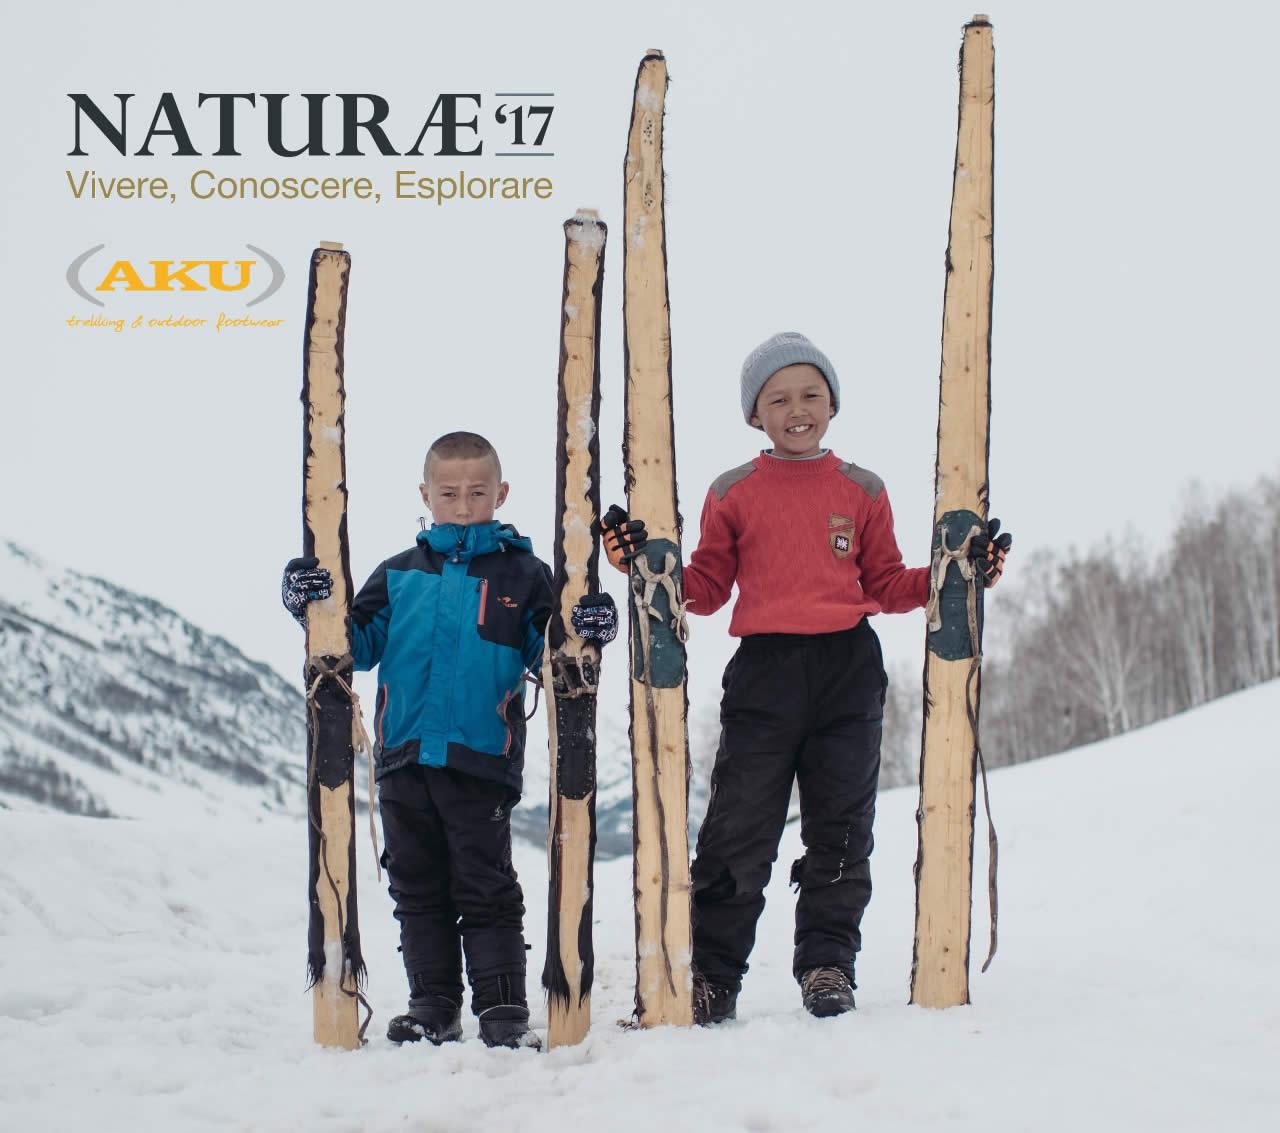 naturae17_01